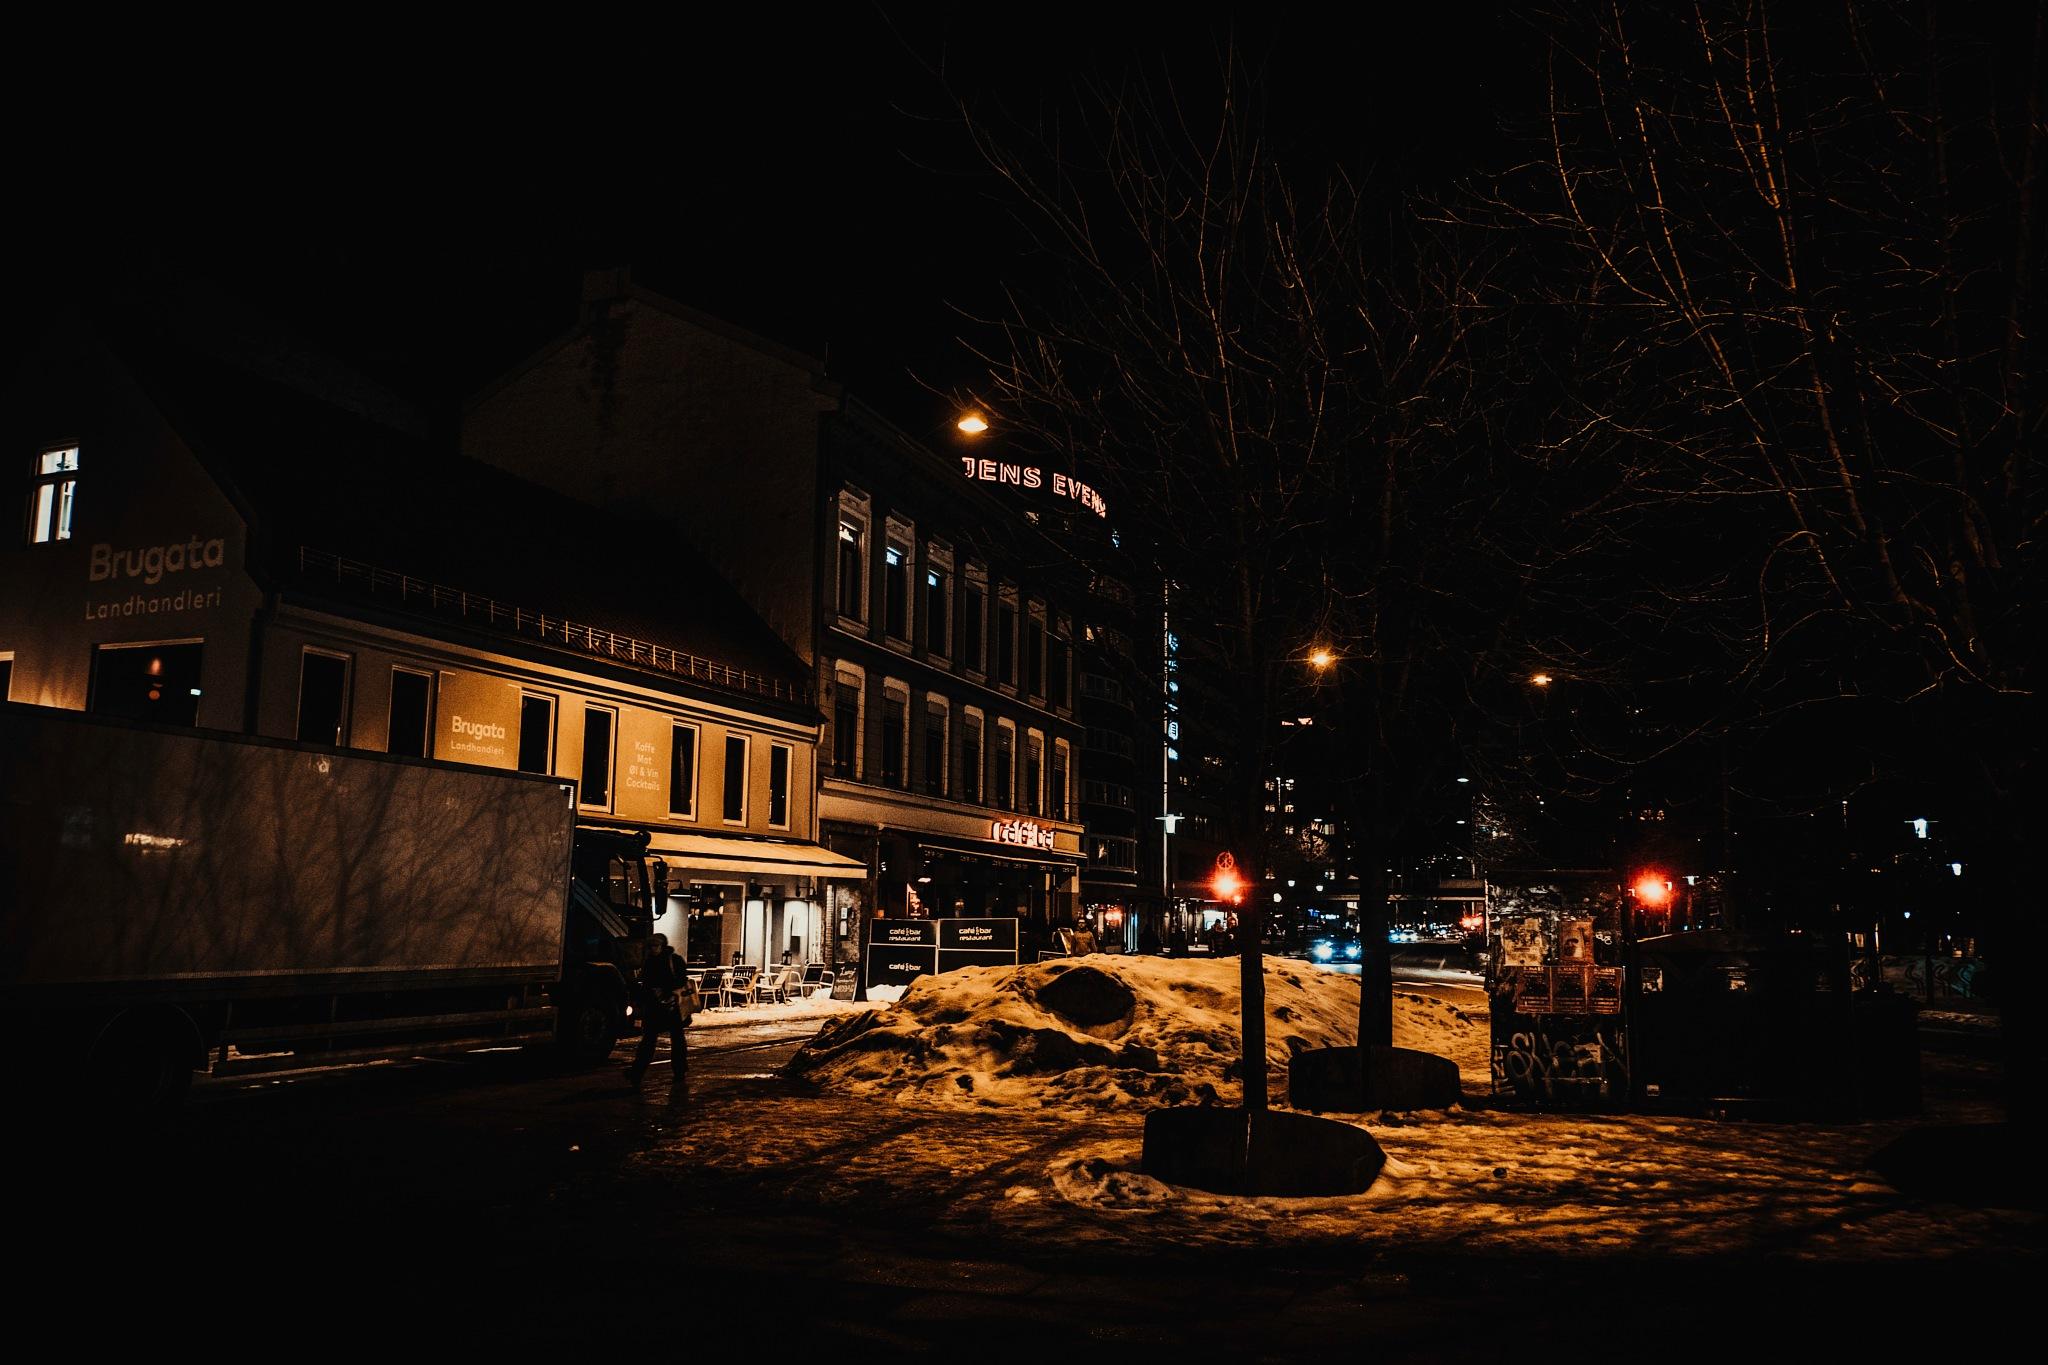 NIGHT LIGHTS OF GOTHAM CITY  by Goran Jorganovich